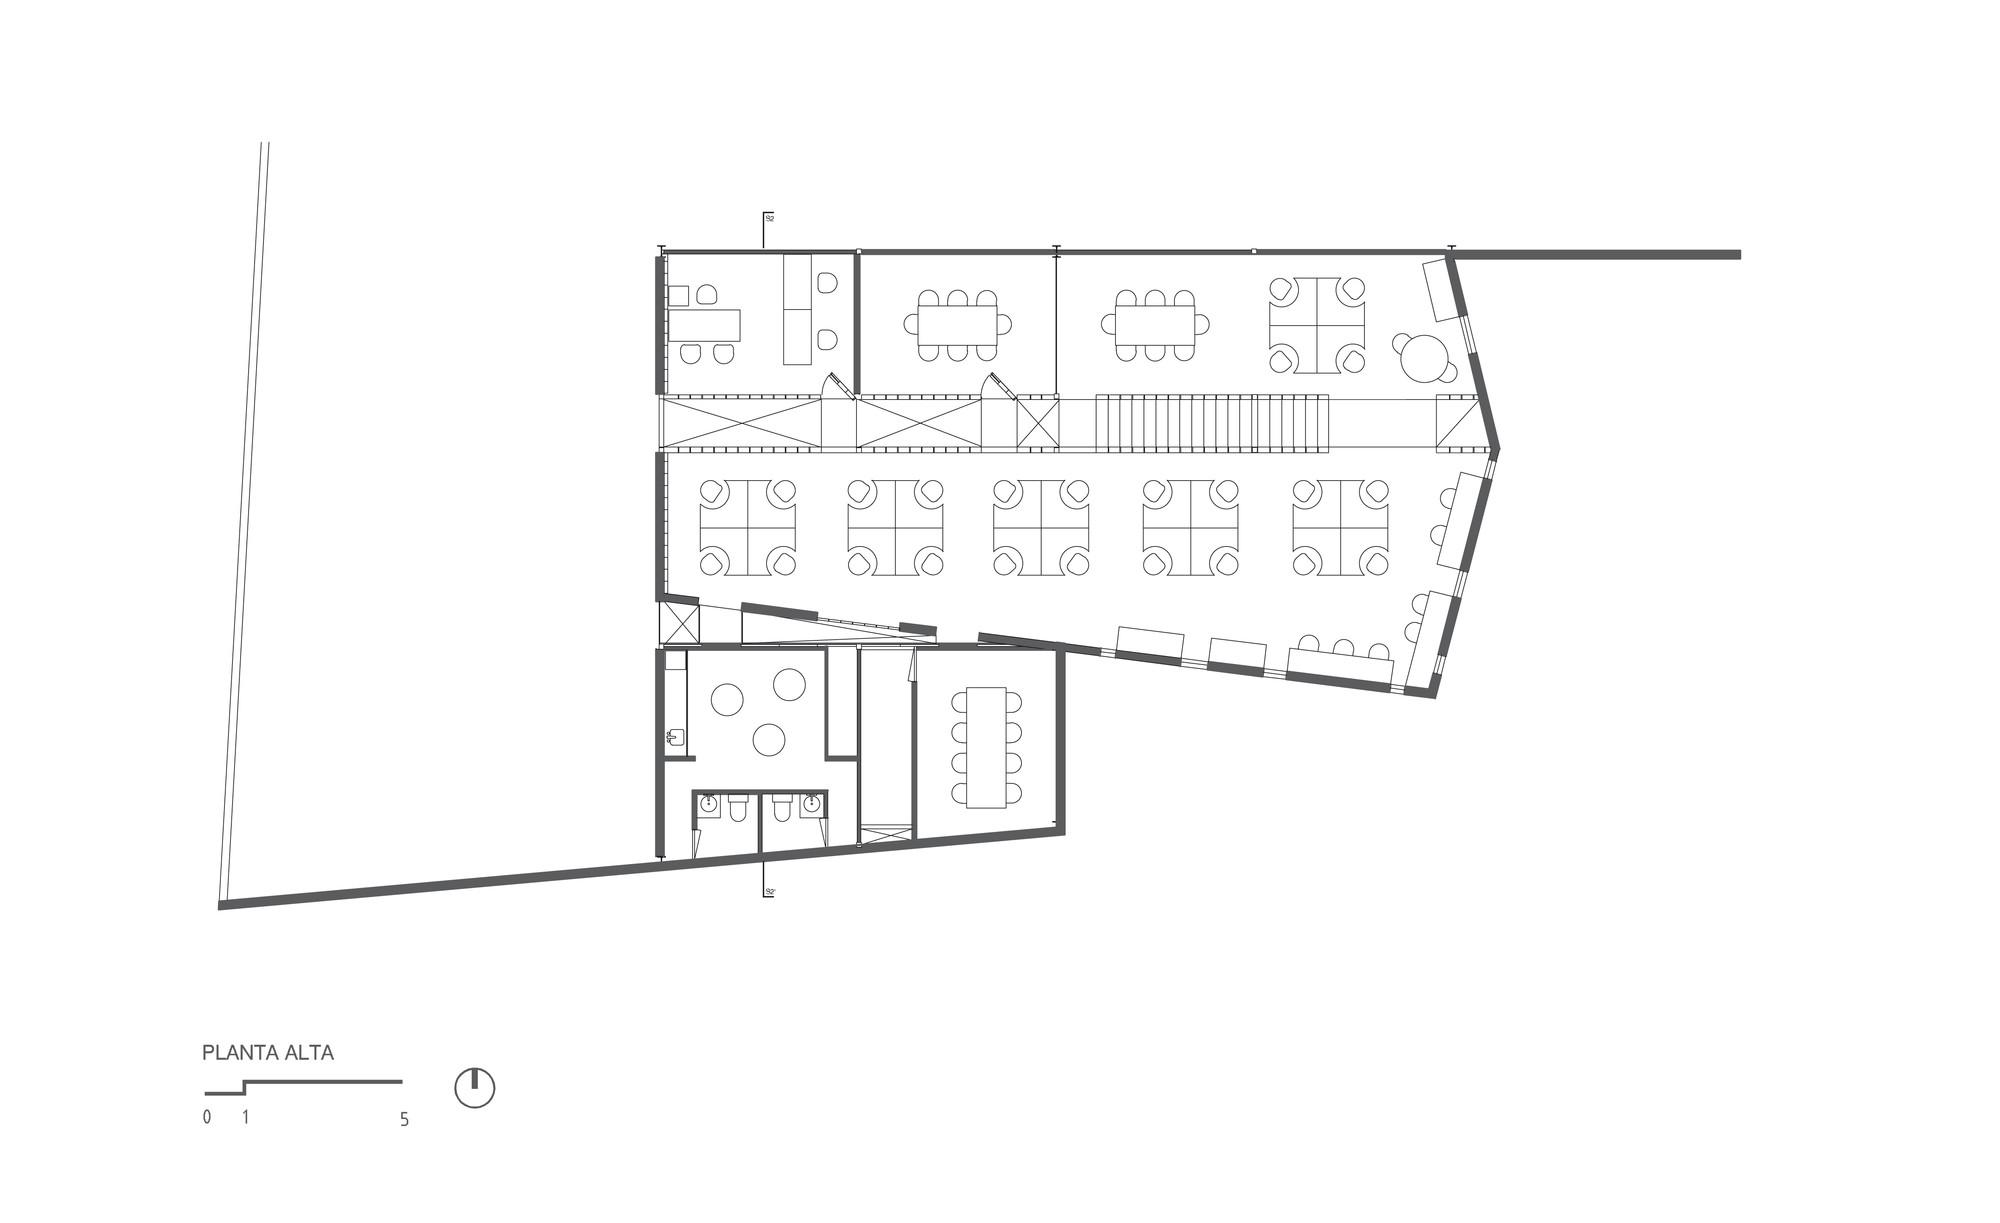 Galer a de bodega tesist n coa arquitectura estudio for Arquitectura 5 de mayo plan de estudios